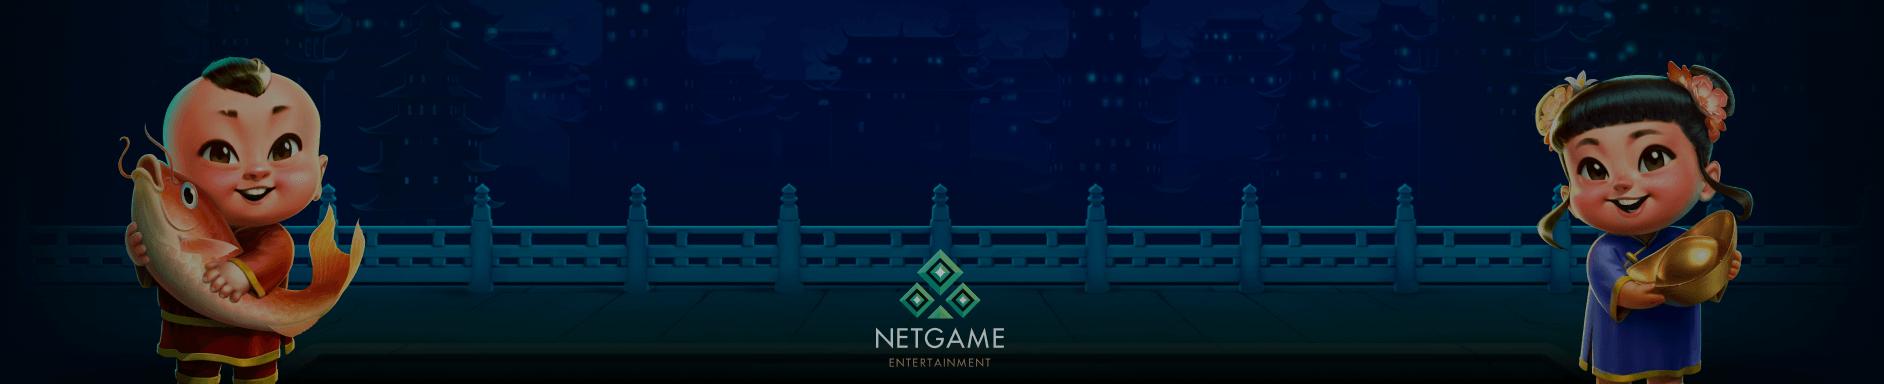 NetGame continues its rich vein of form with Zen Zen Cash release